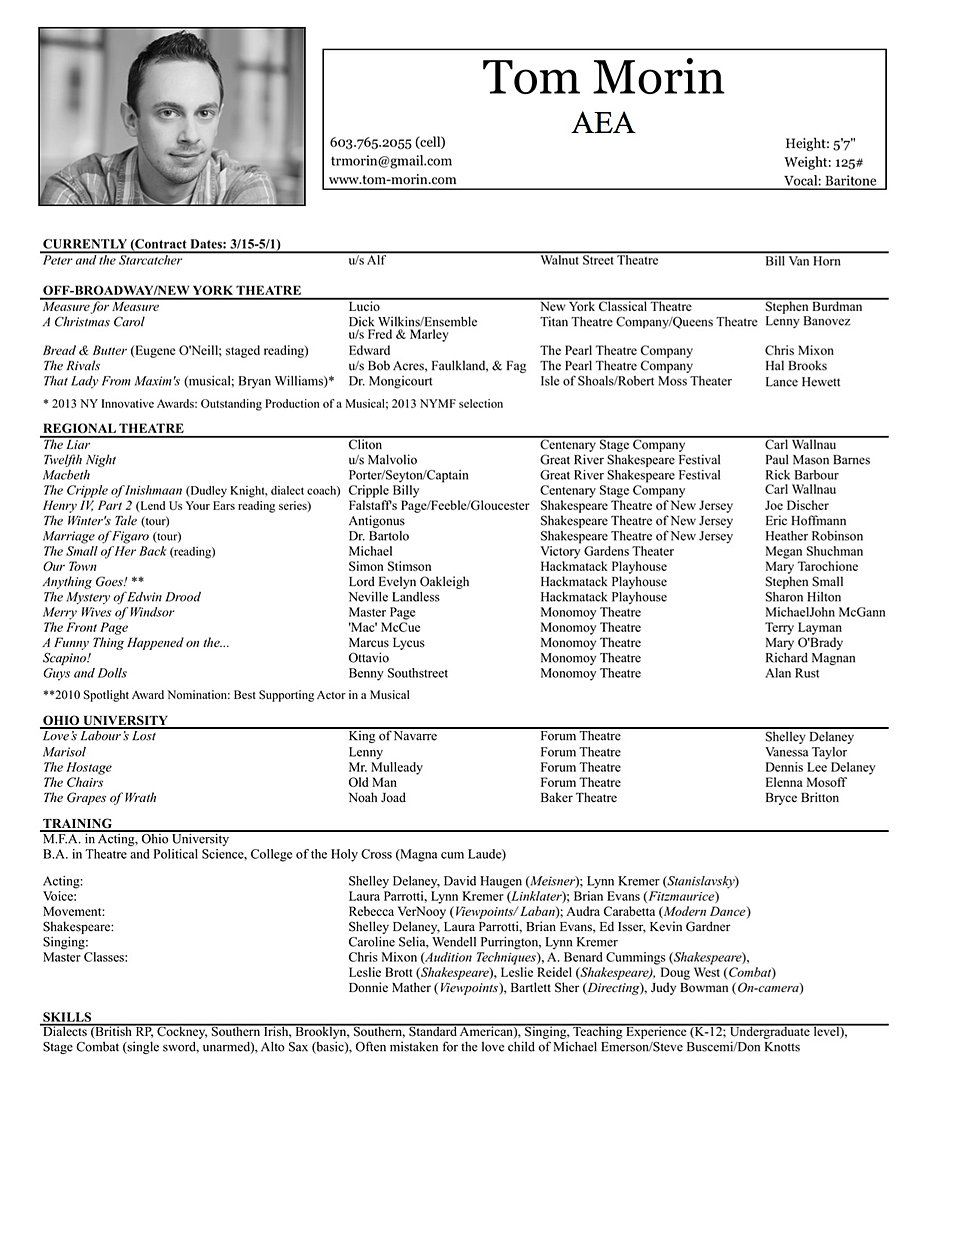 tom morin nyc actor resume tommorin resume